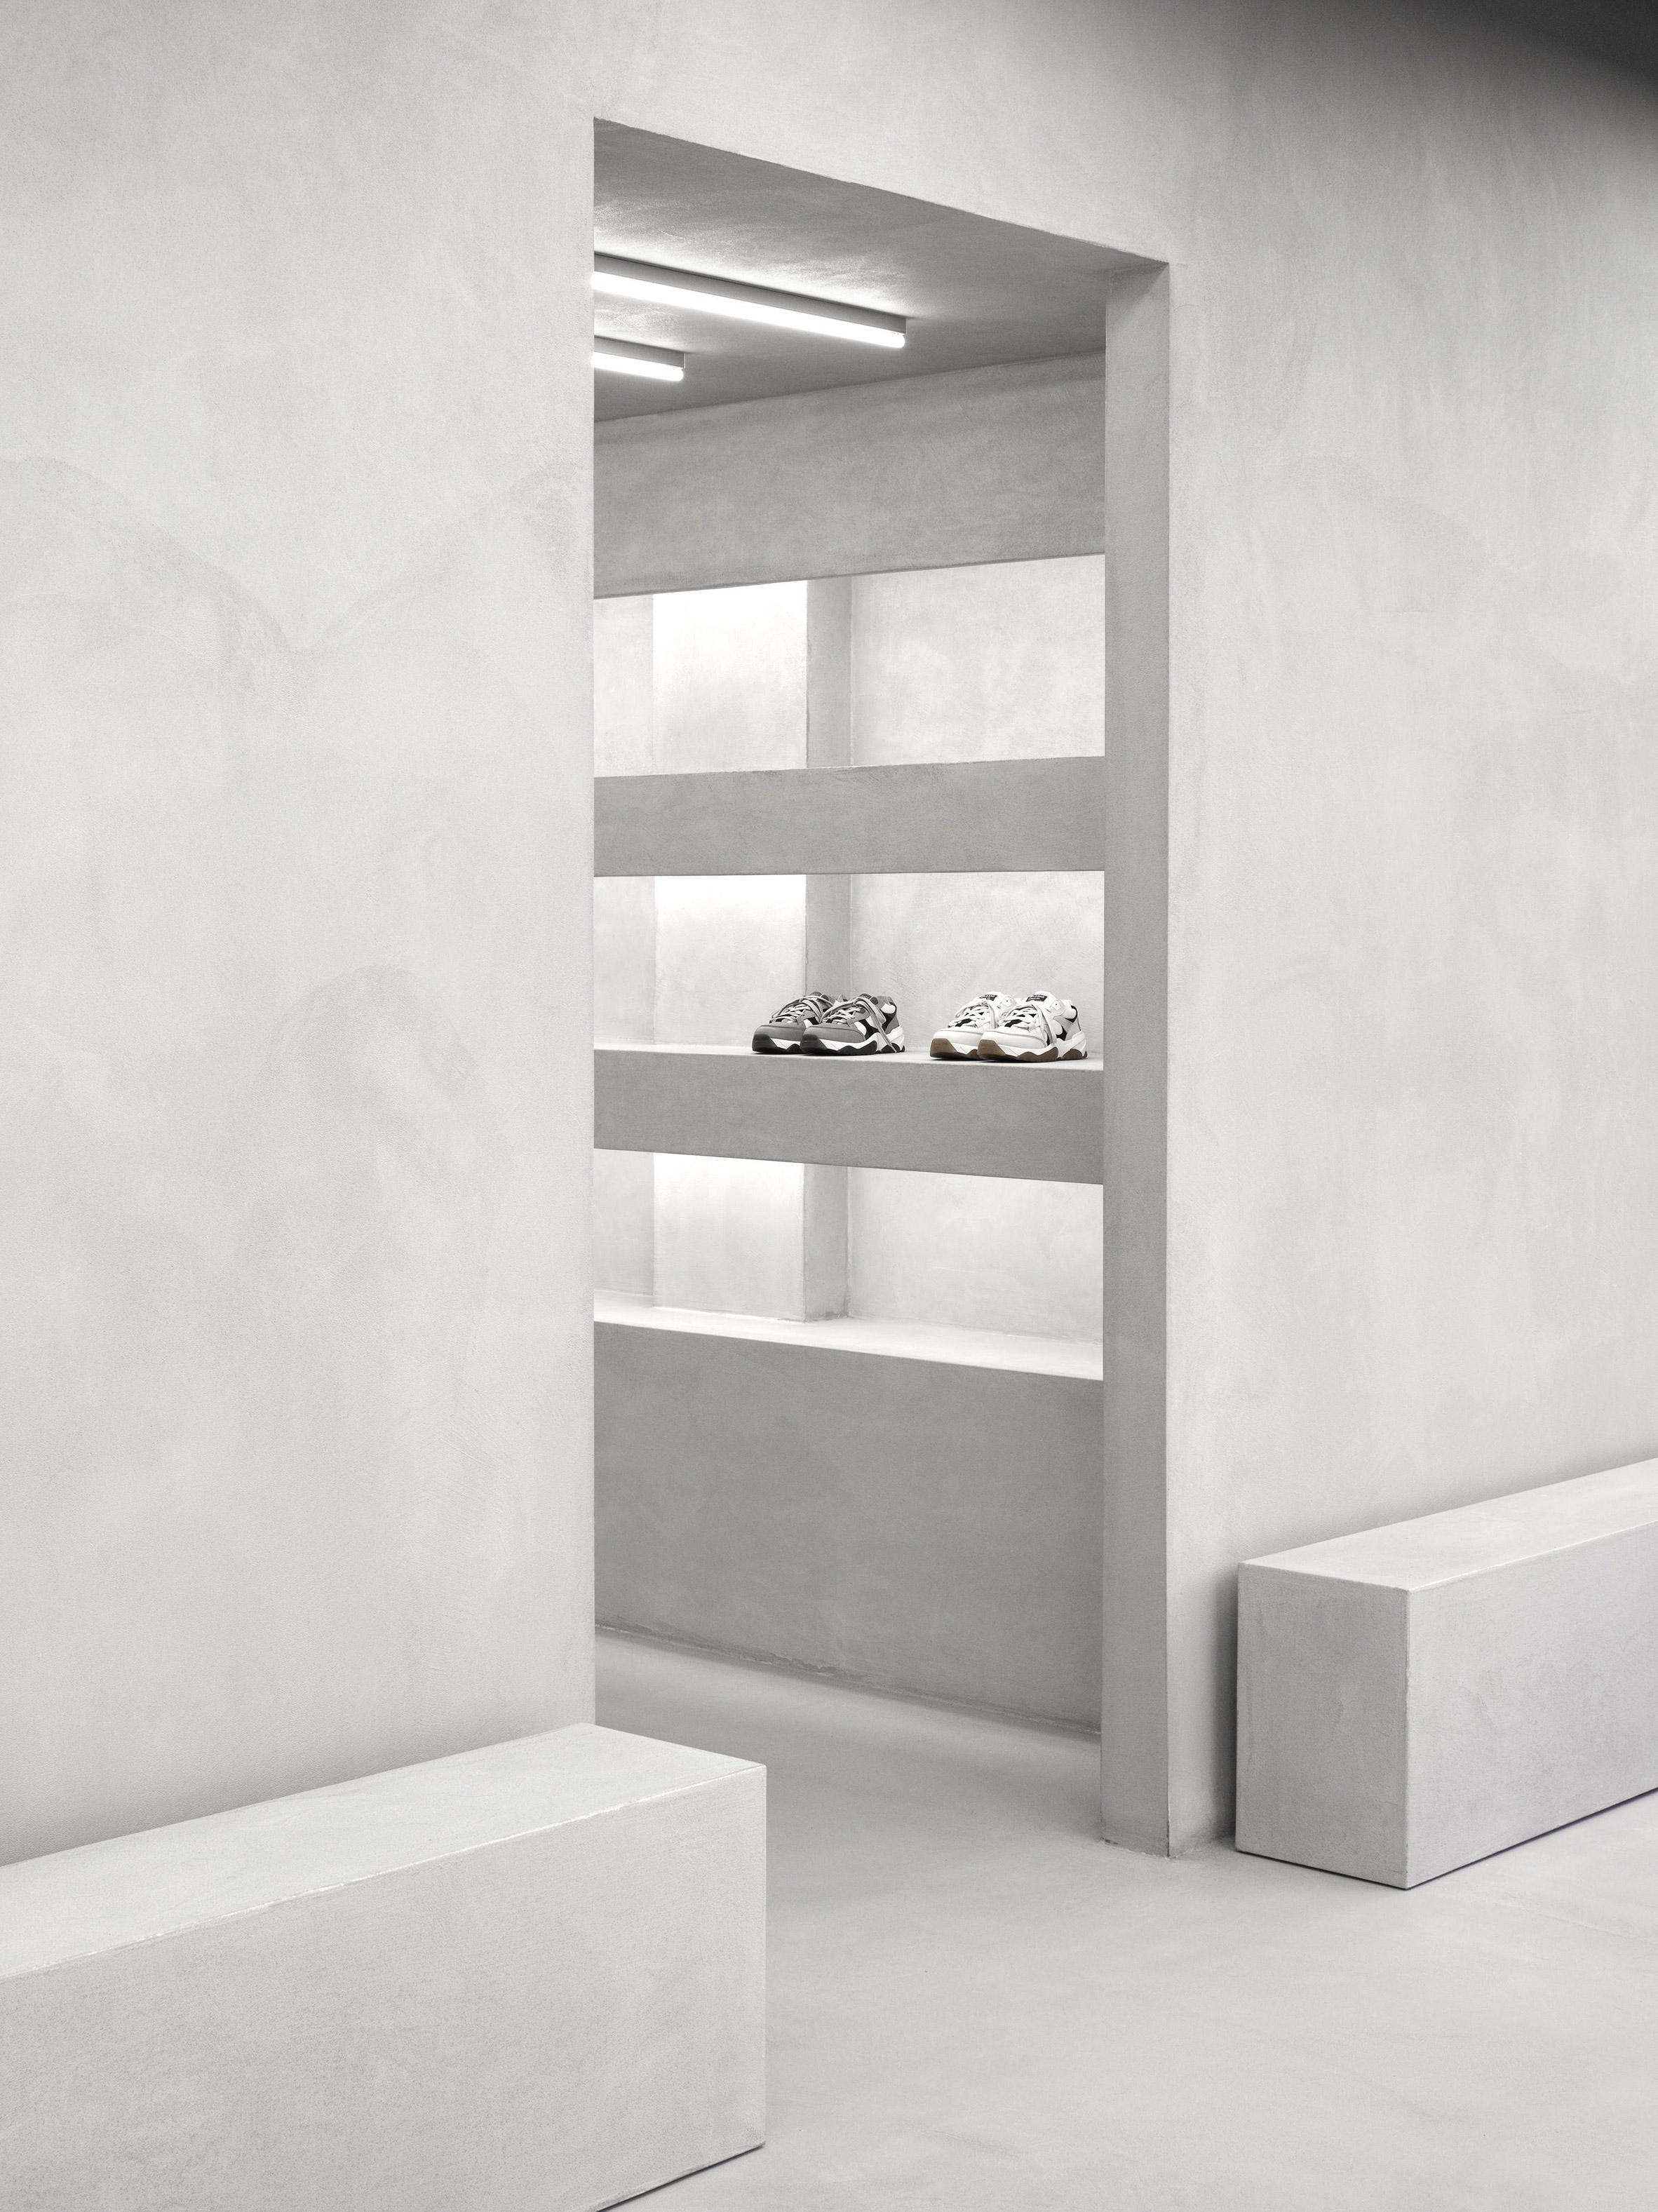 Interior Design News - Interior Design - Library and Academic